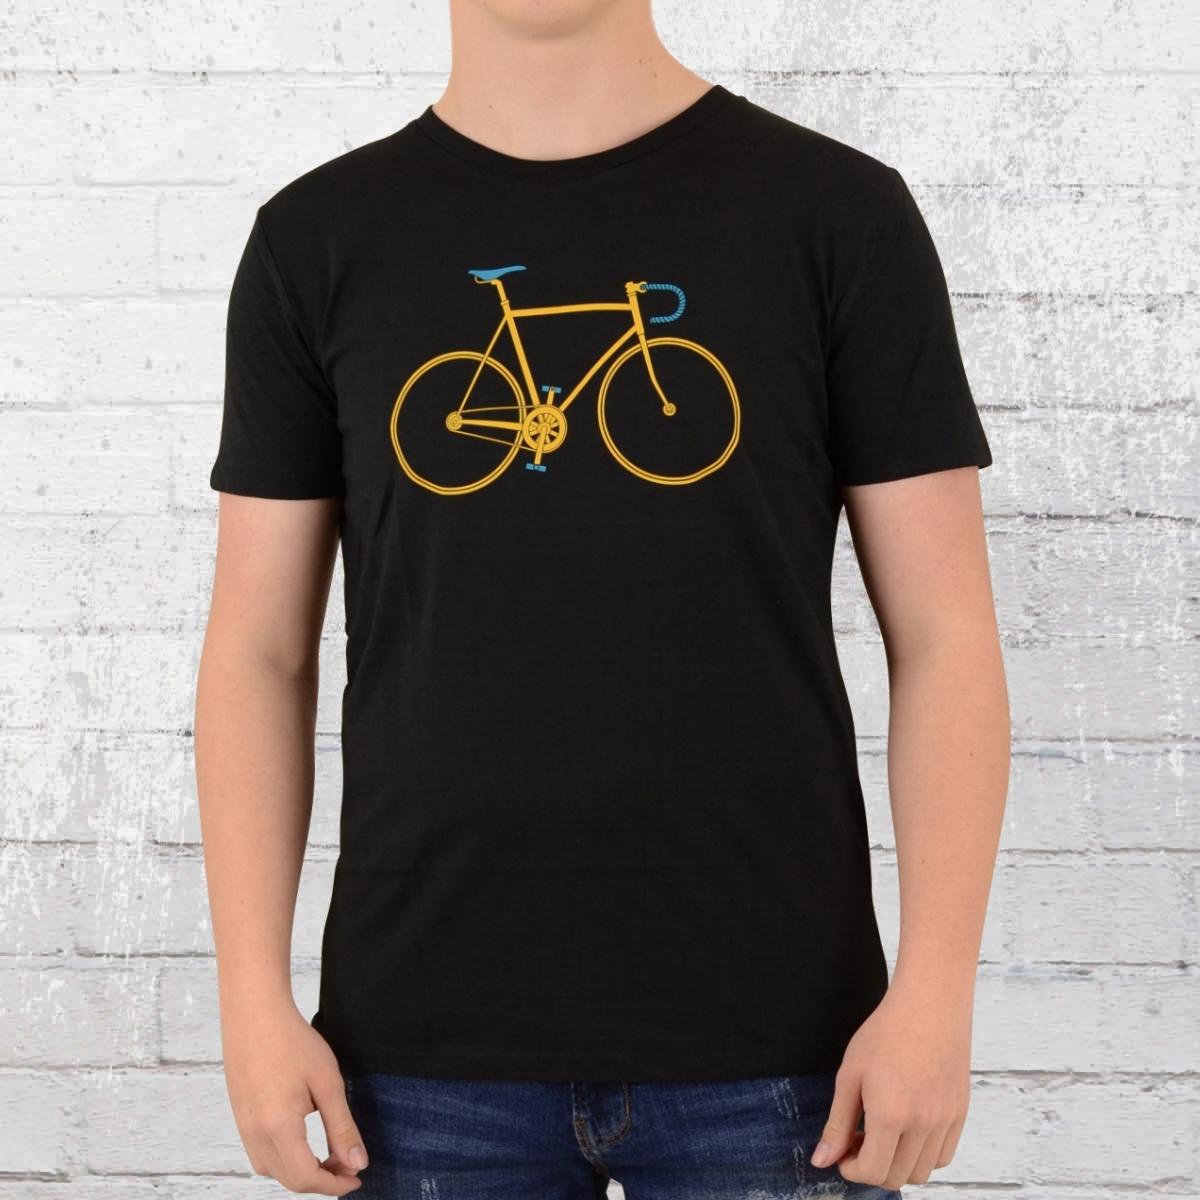 Greenbomb Herren Rennrad T-Shirt Bike Trip schwarz